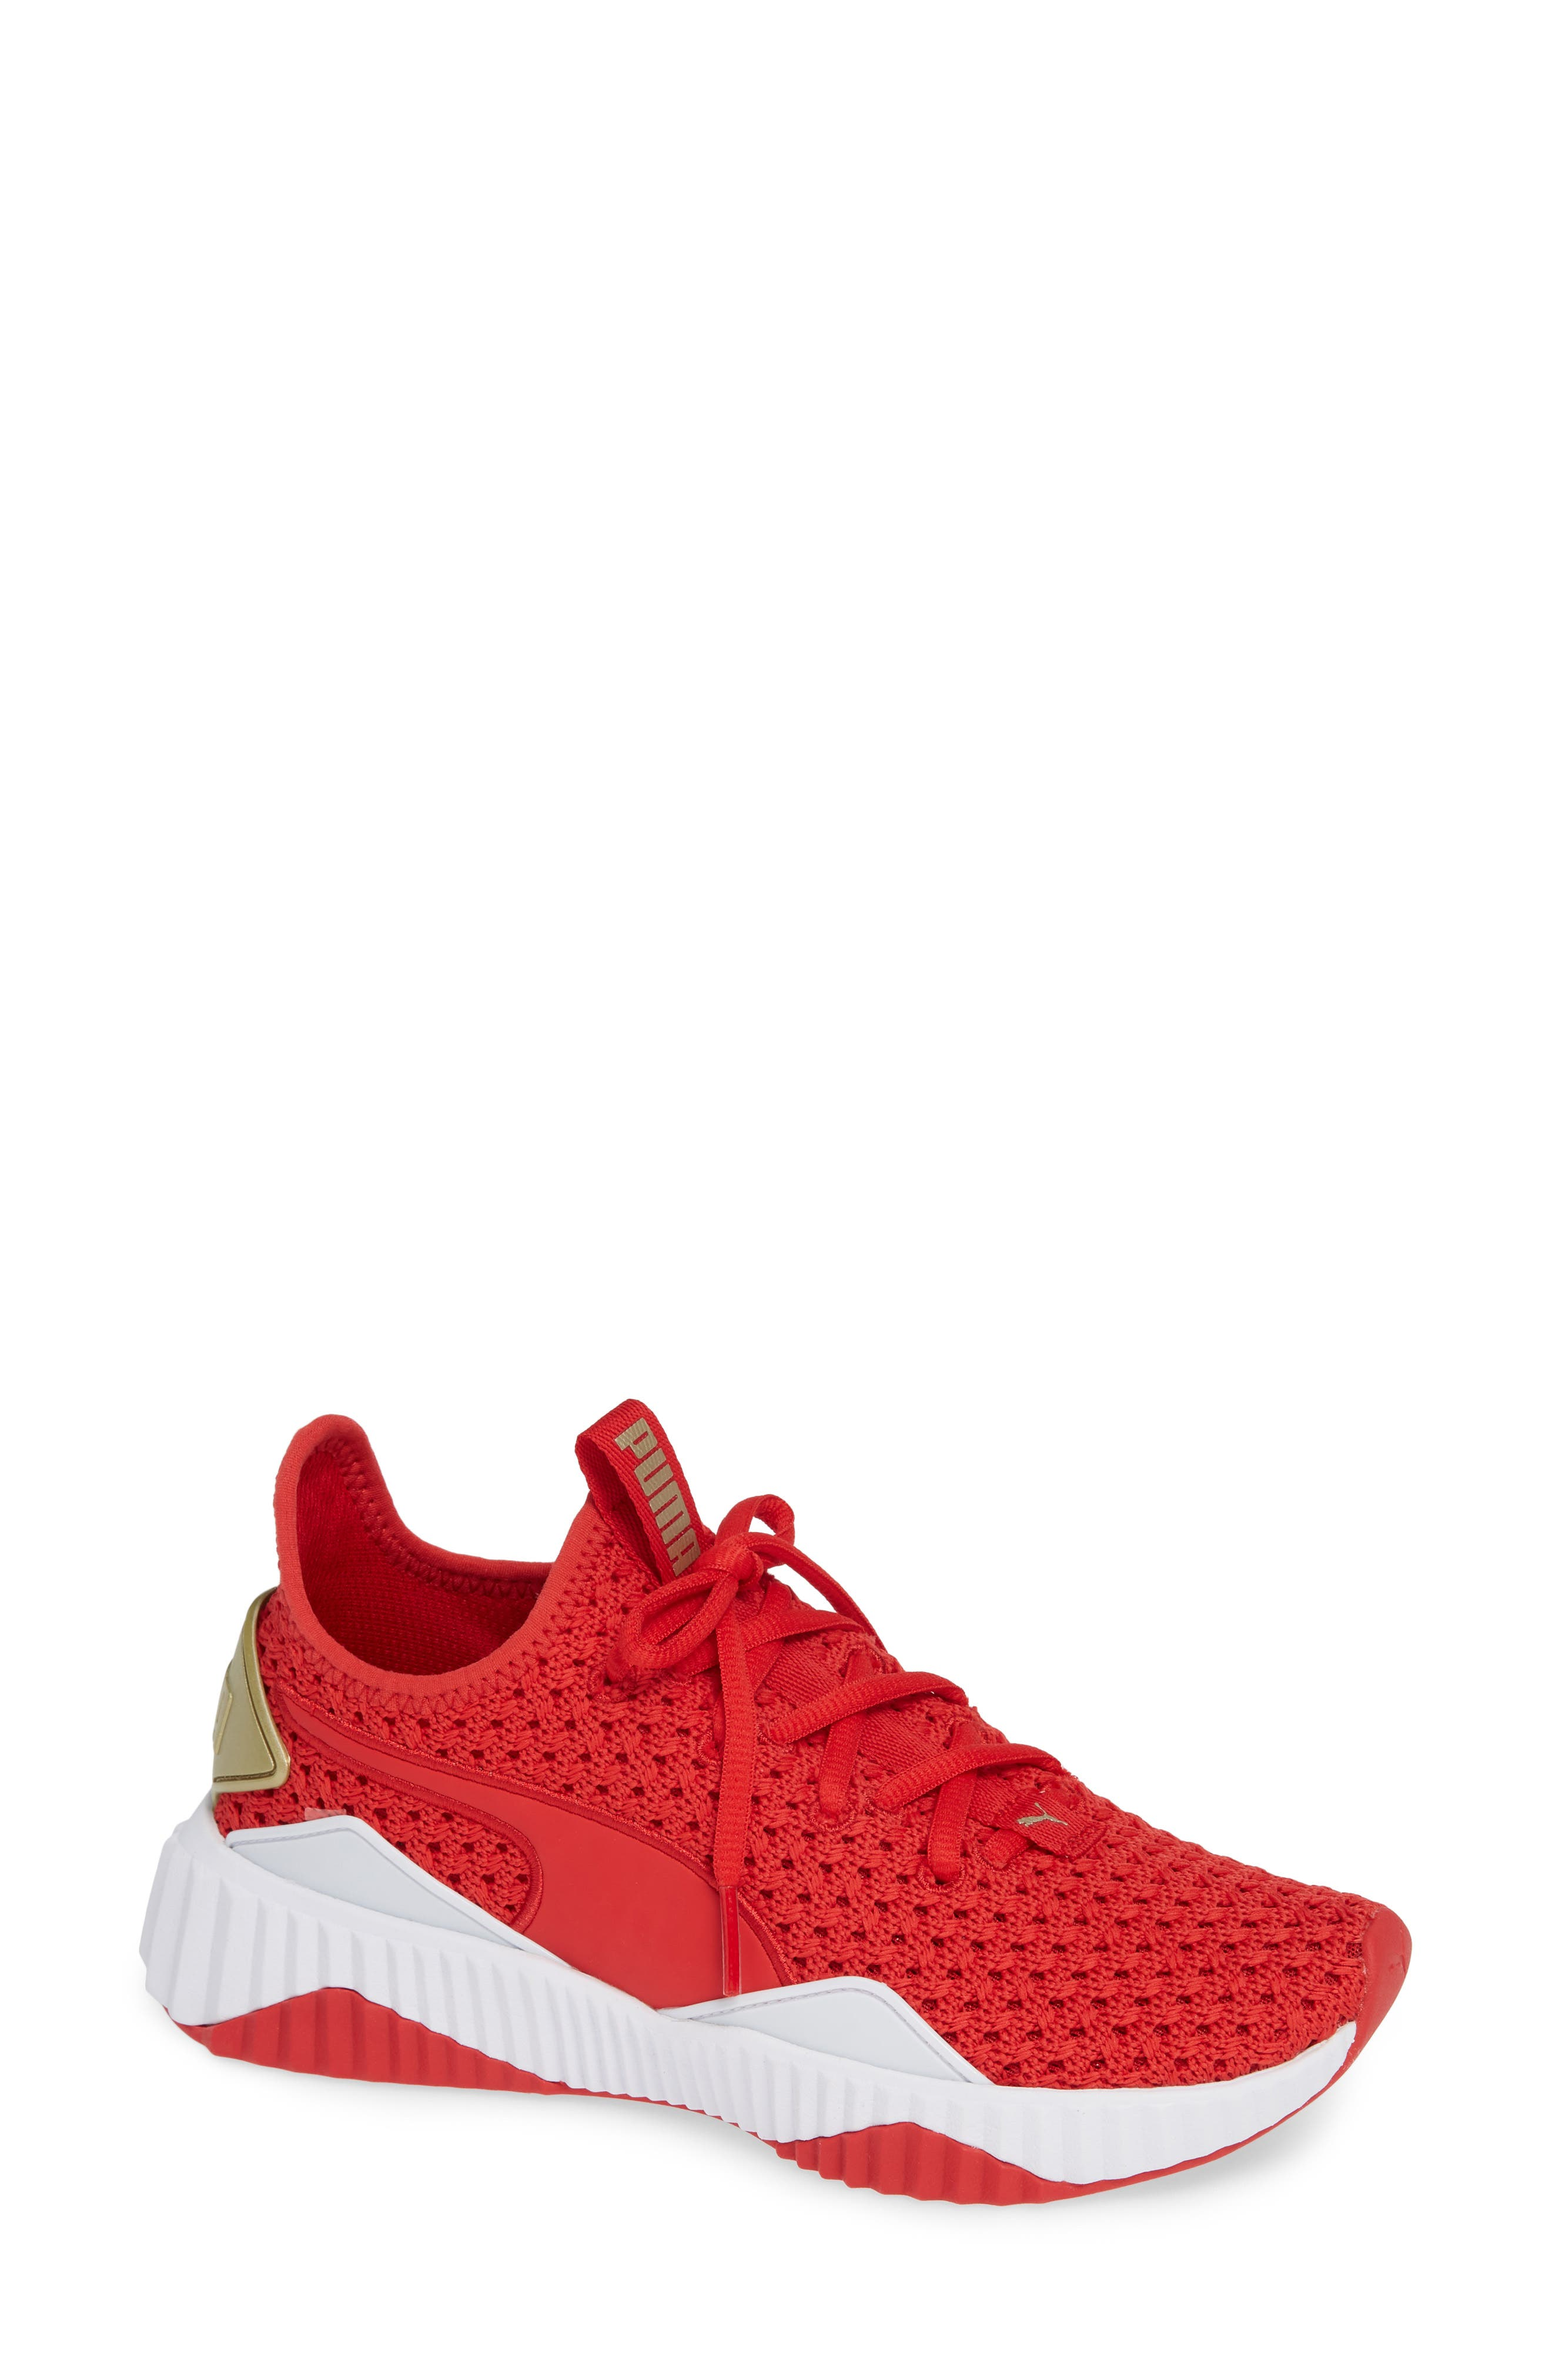 Defy Varsity Sneaker,                             Main thumbnail 1, color,                             RIBBON RED/ METALLIC GOLD